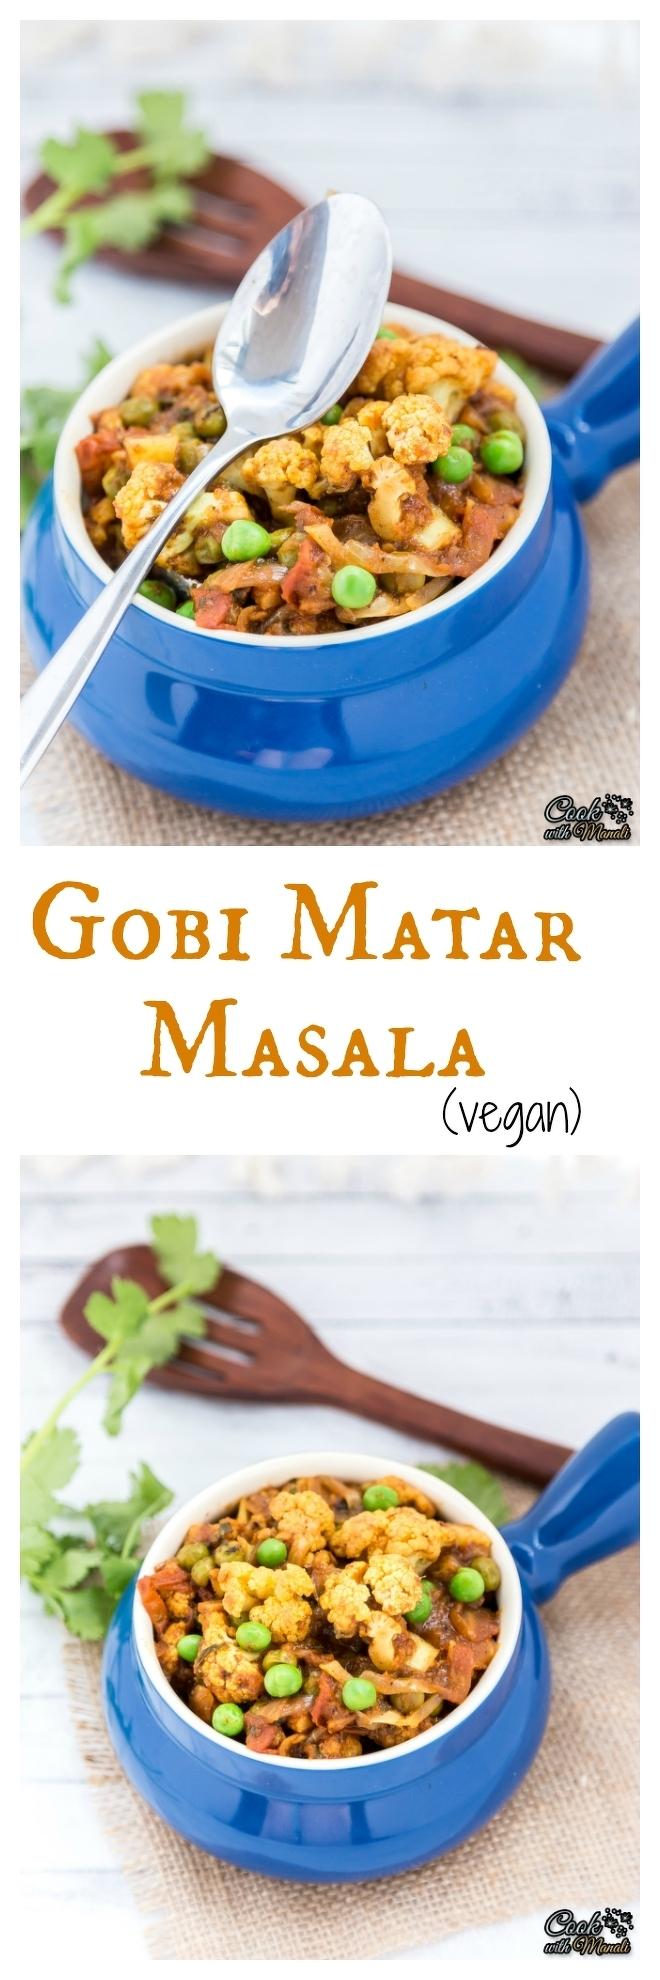 Gobi Matar Masala-nocwm